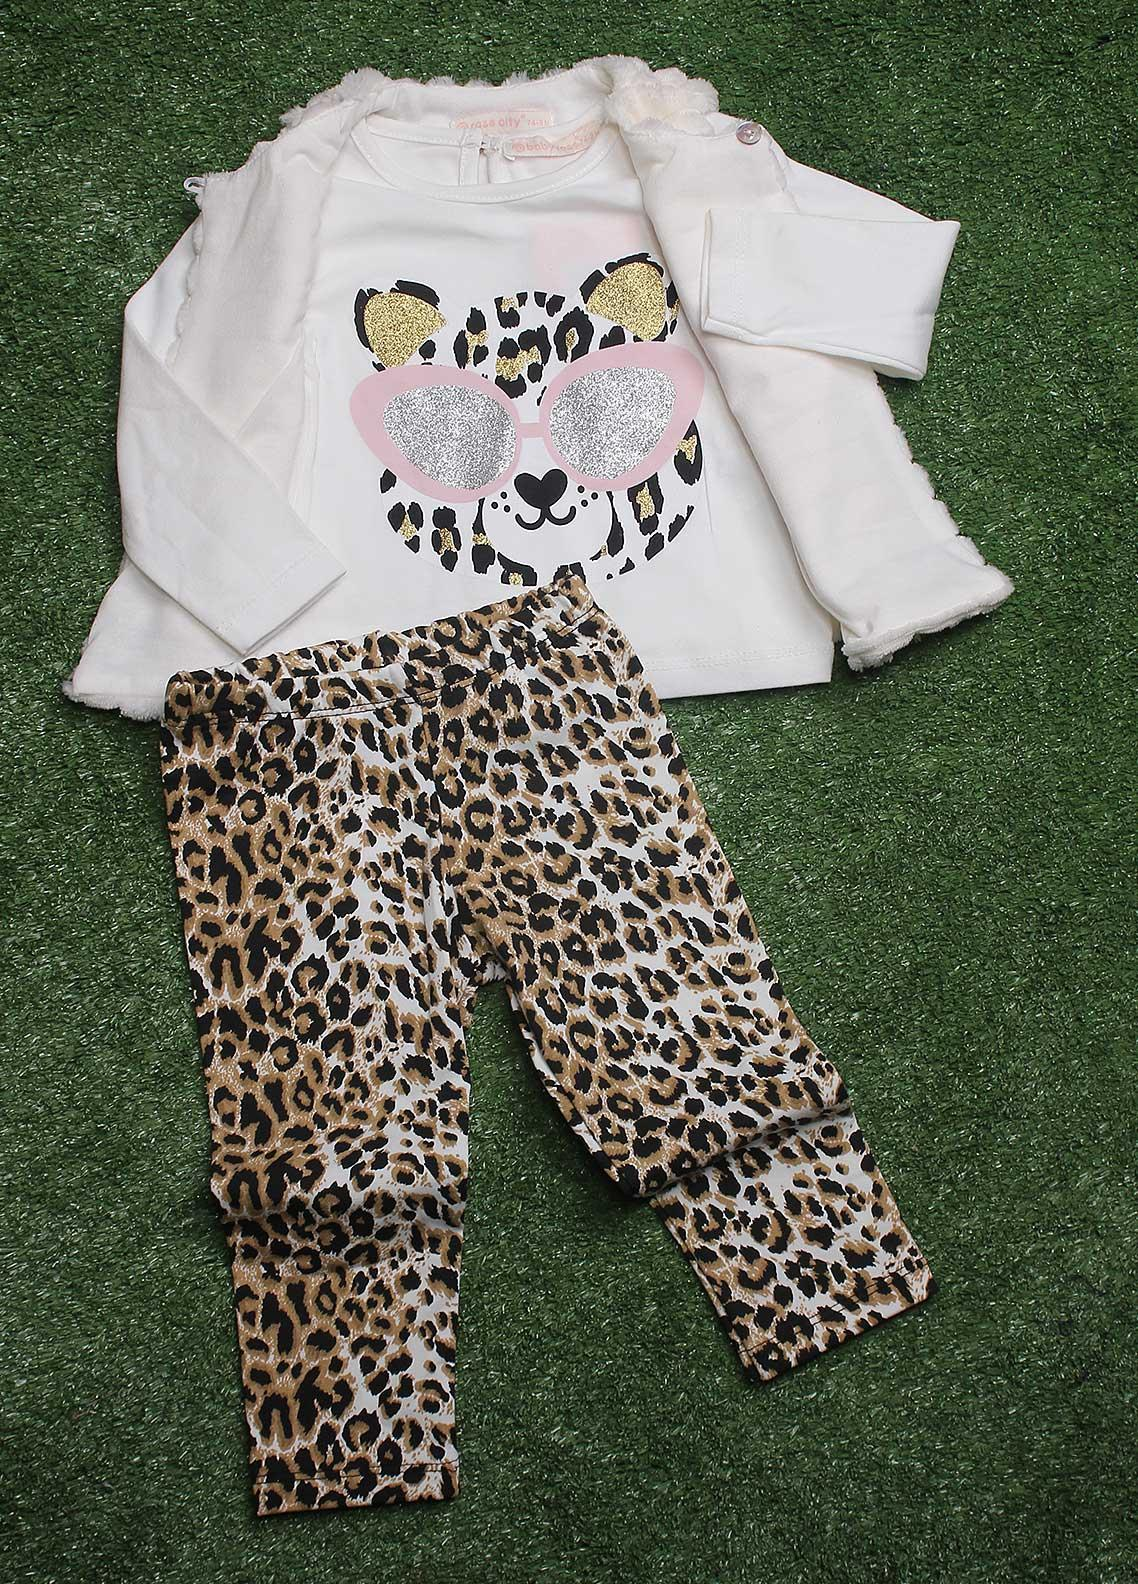 Sanaulla Exclusive Range Fancy 3 Piece Suit for Girls - 7514 White